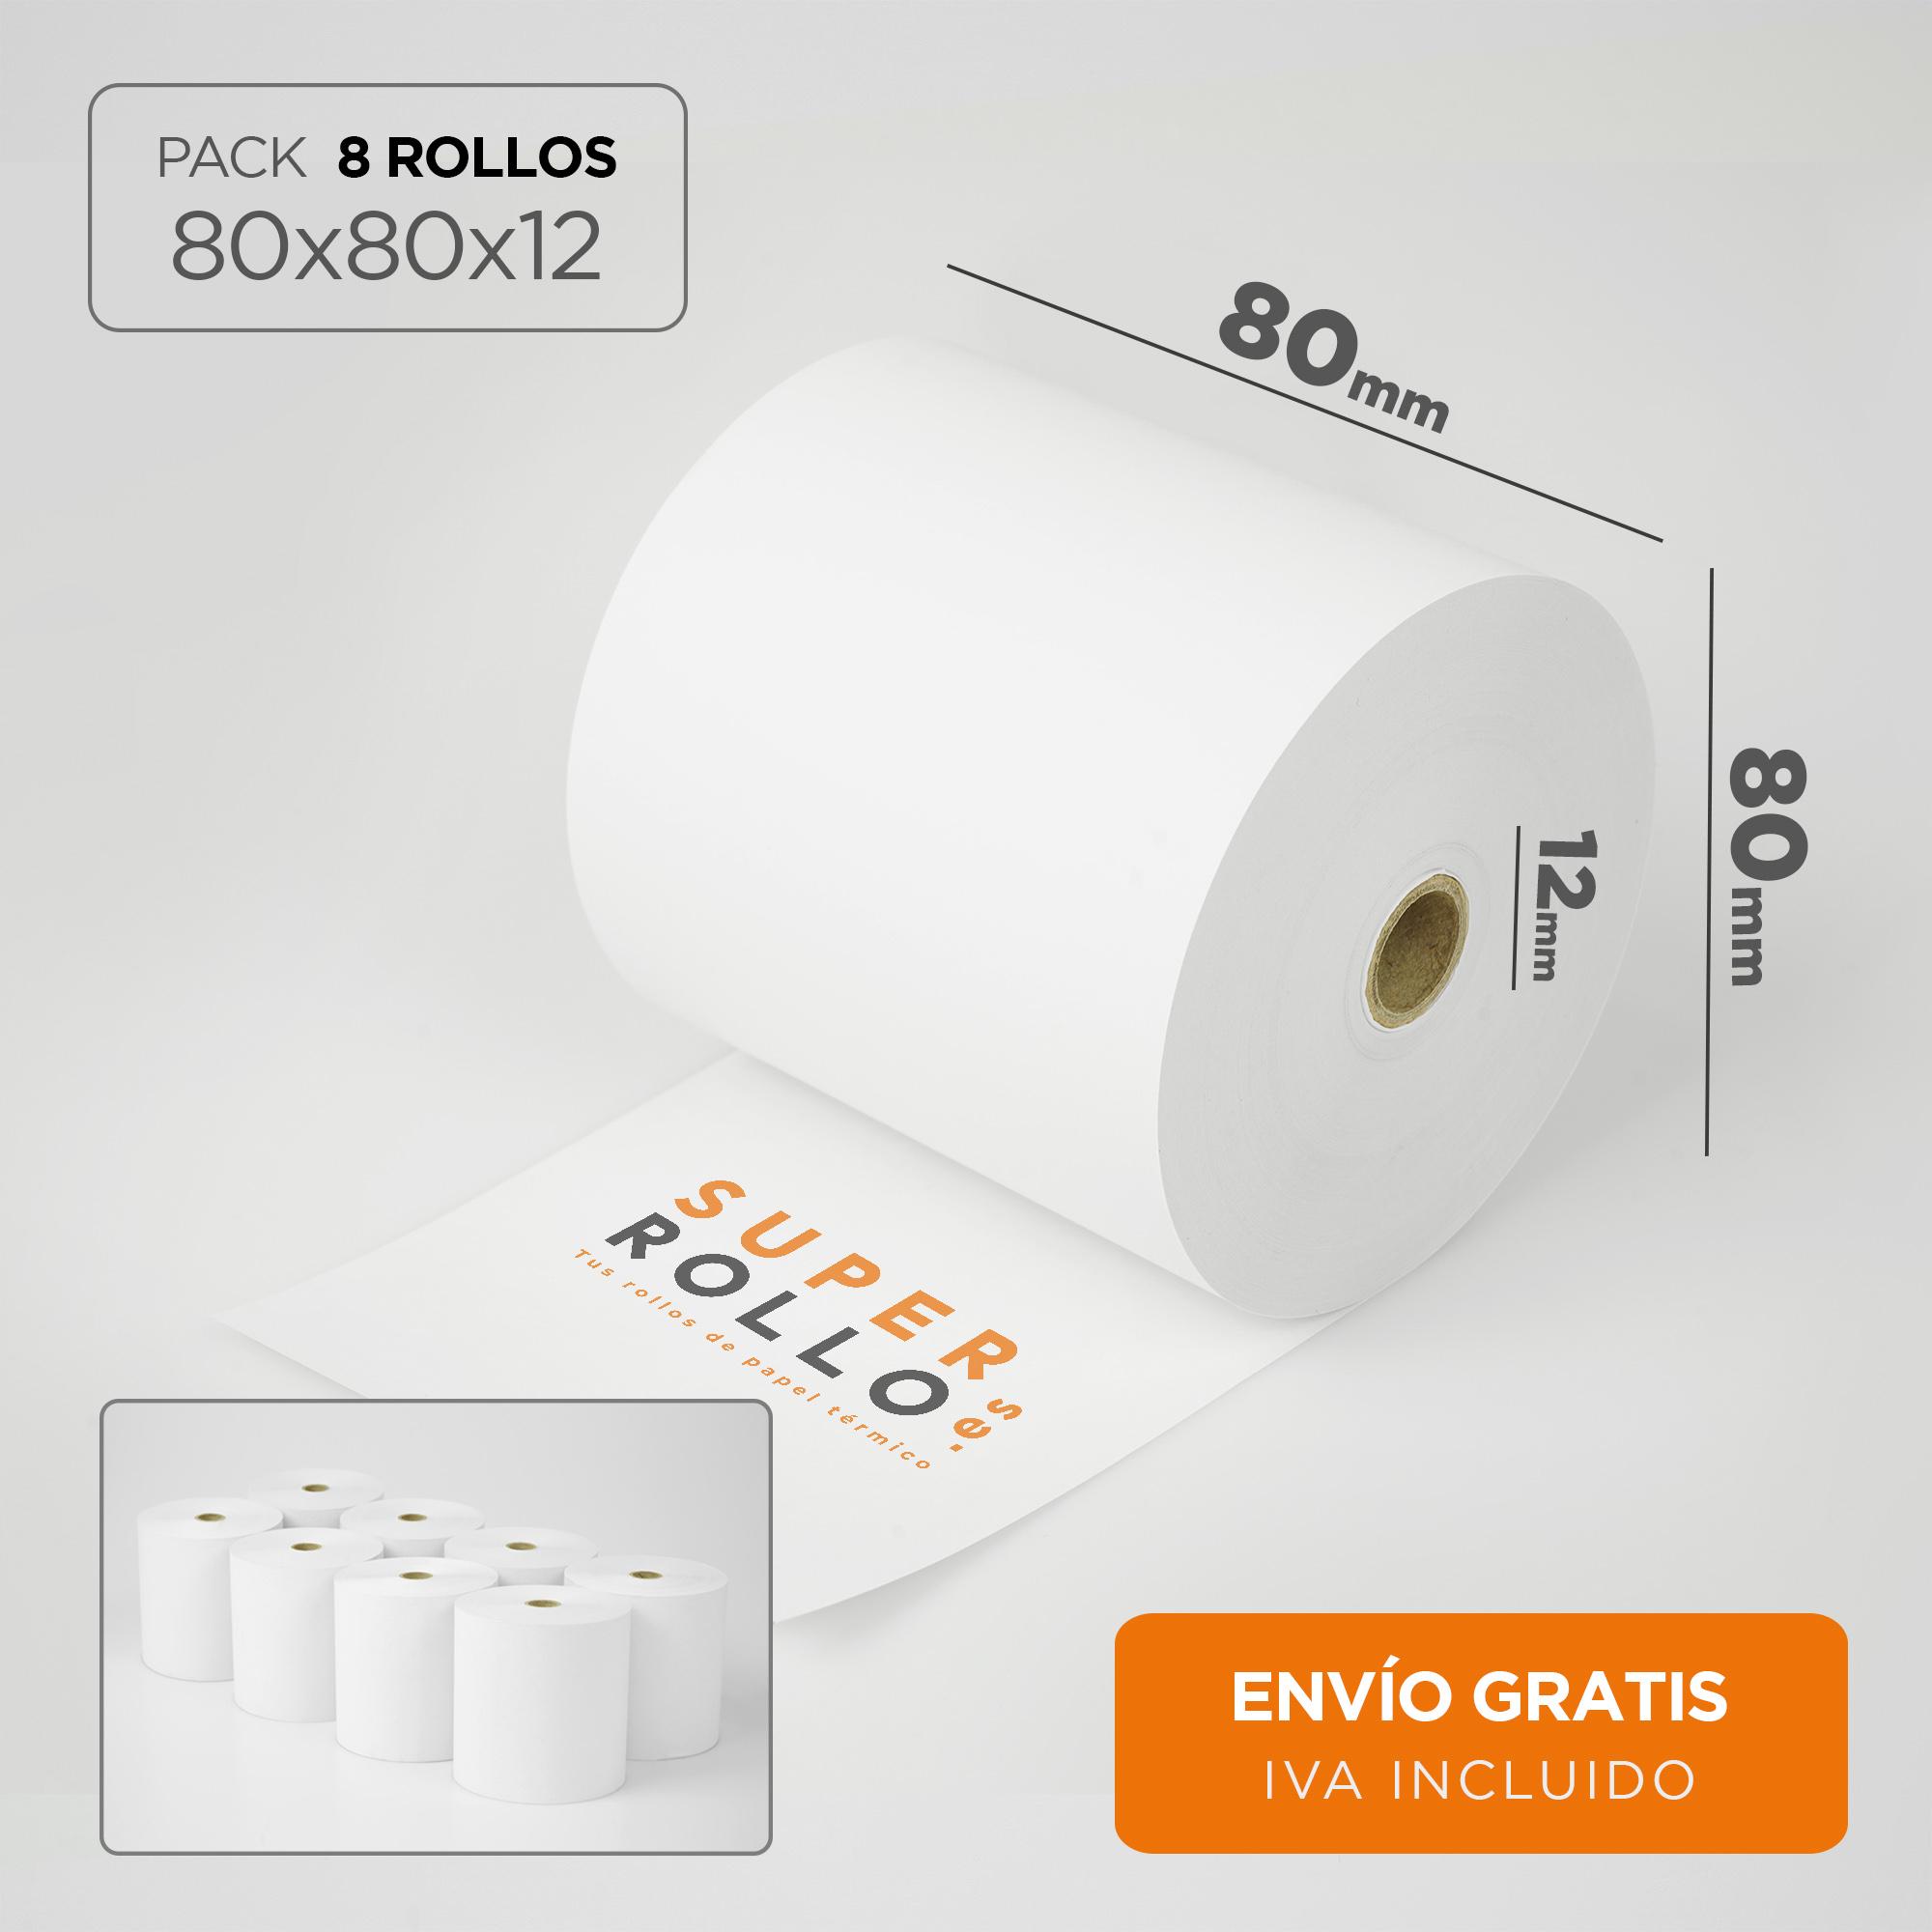 PACK_8-ROLLOS_80x80x12